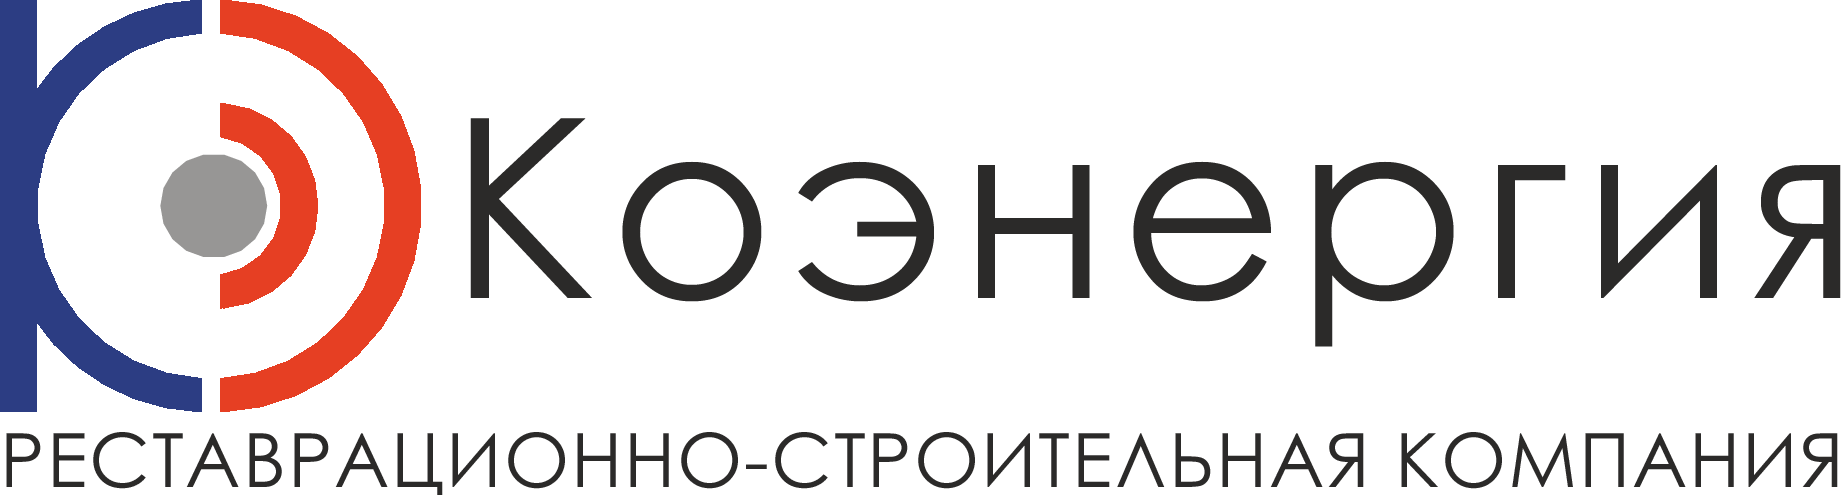 "ООО ""Коэнергия"""